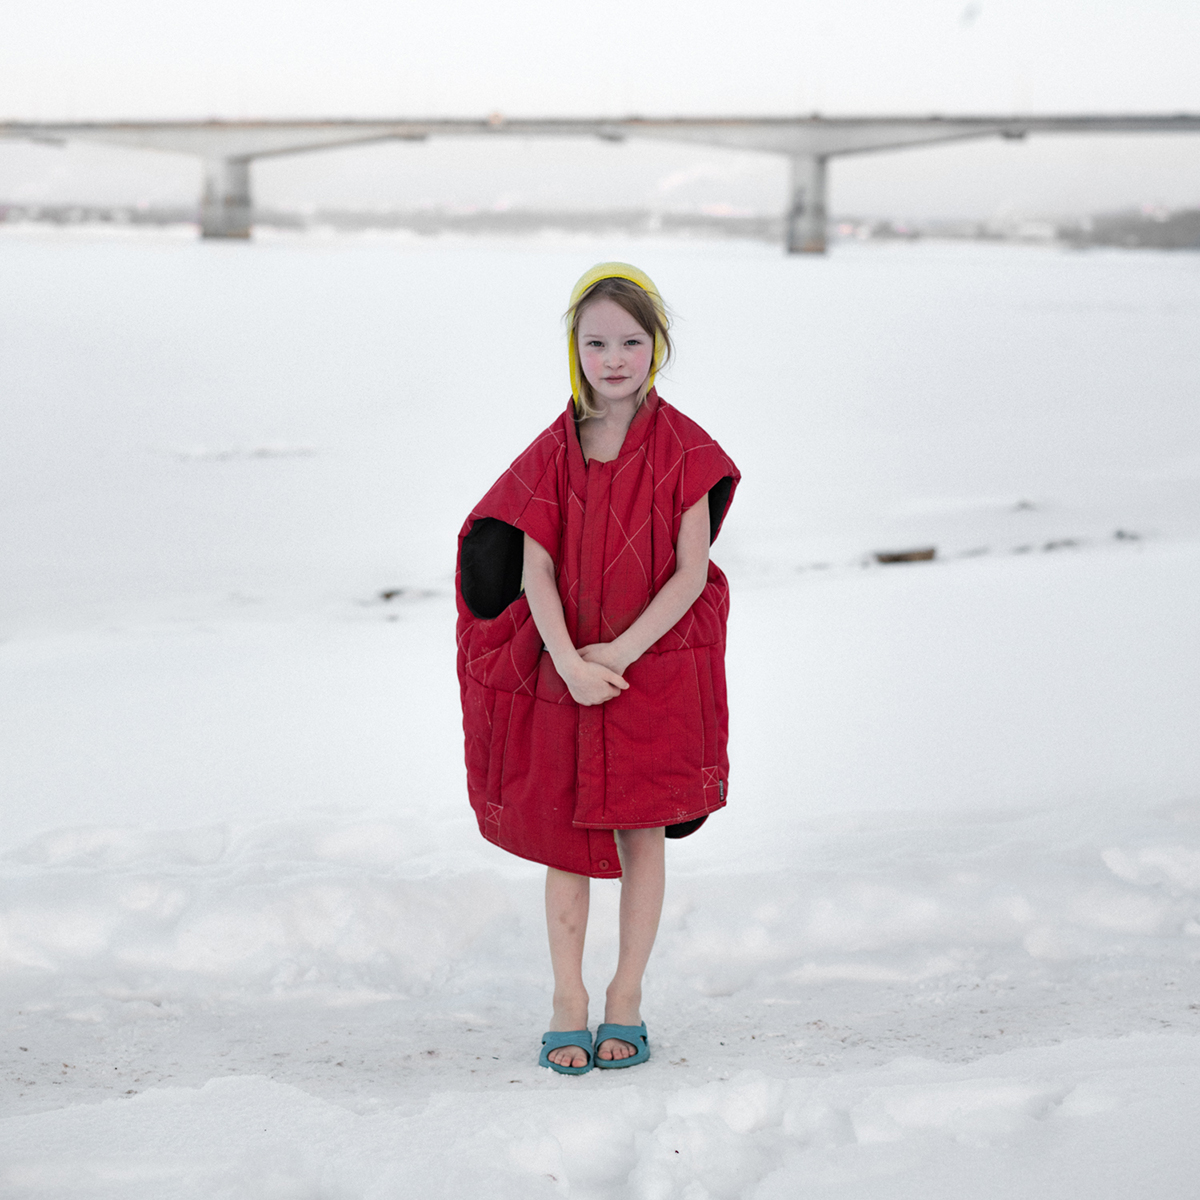 Snezhana Von Buedingen Permer Frost 15